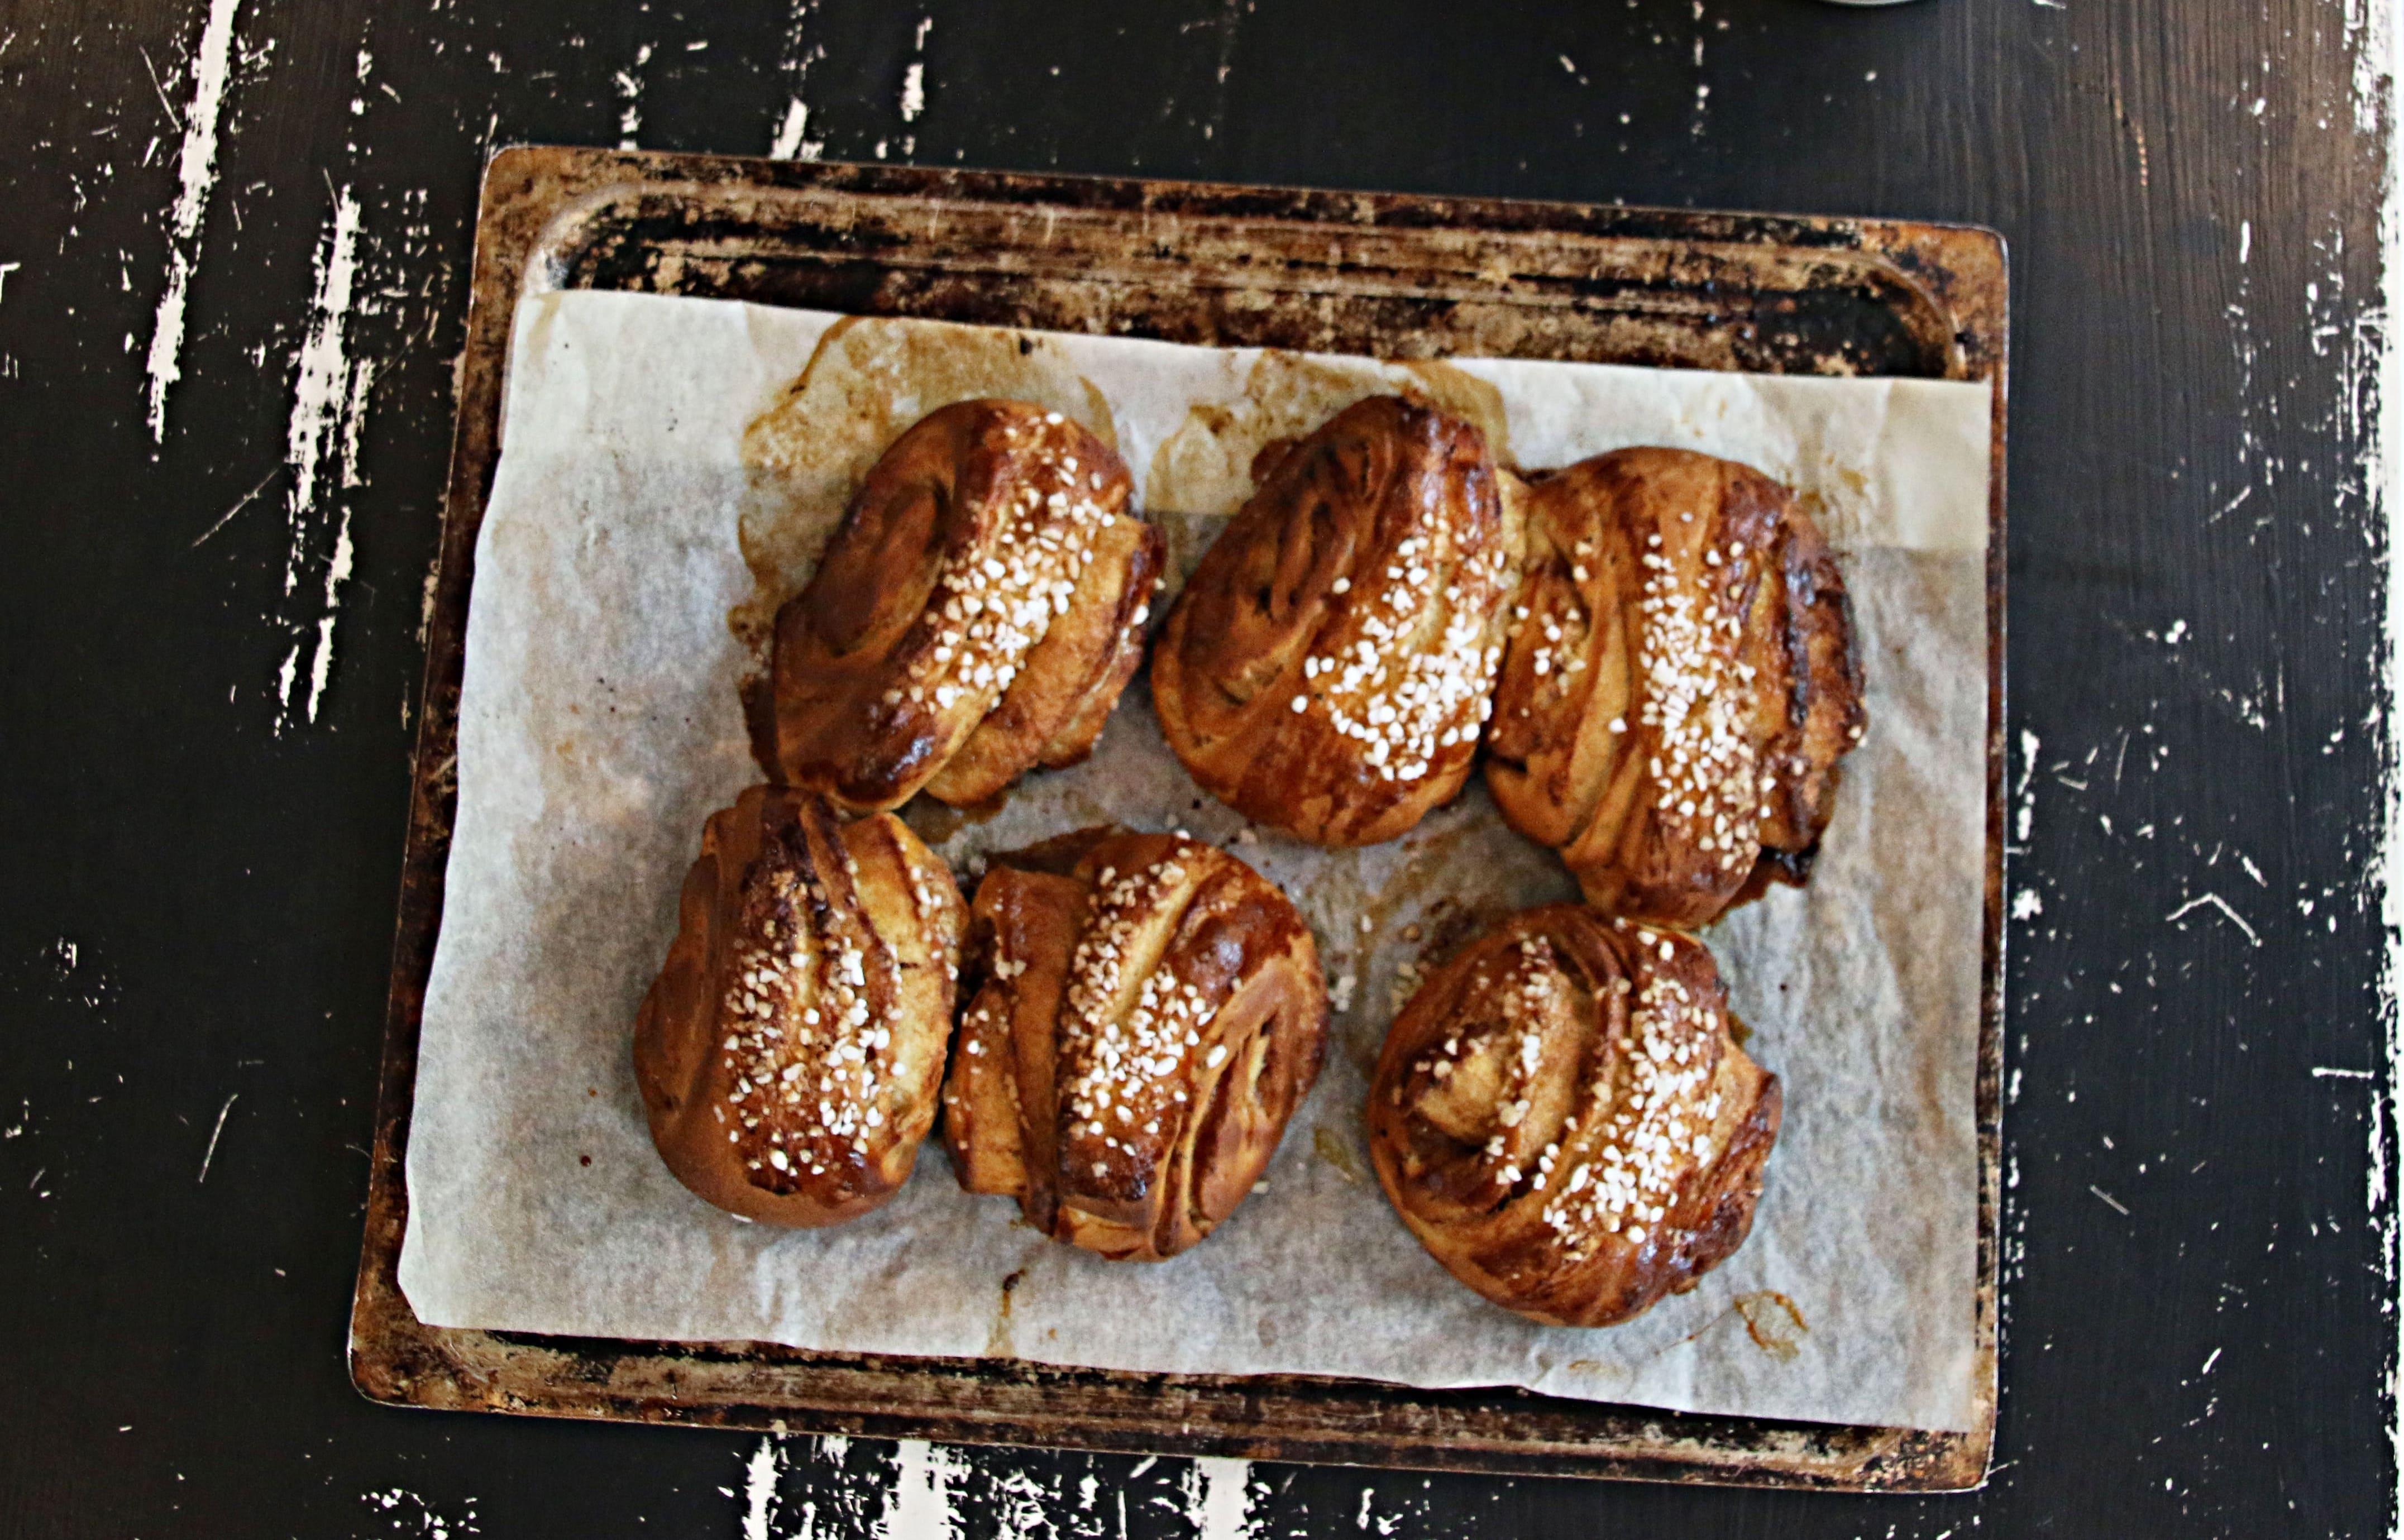 Tamperelainen Café Puusti leipoo parhaat korvapuustit